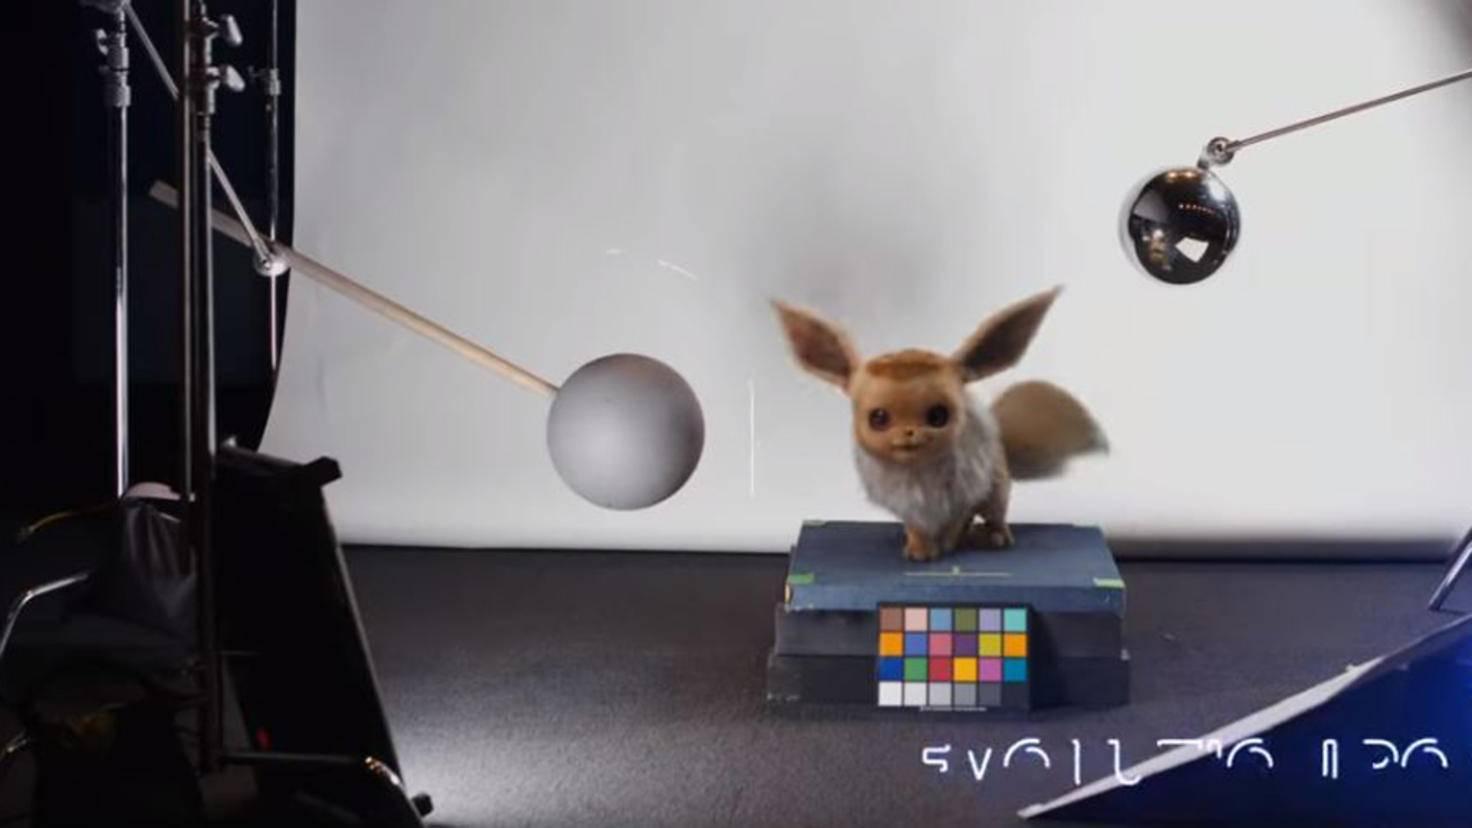 Evoli in Pokémon Meisterdetektiv Pikachu Casting Trailer